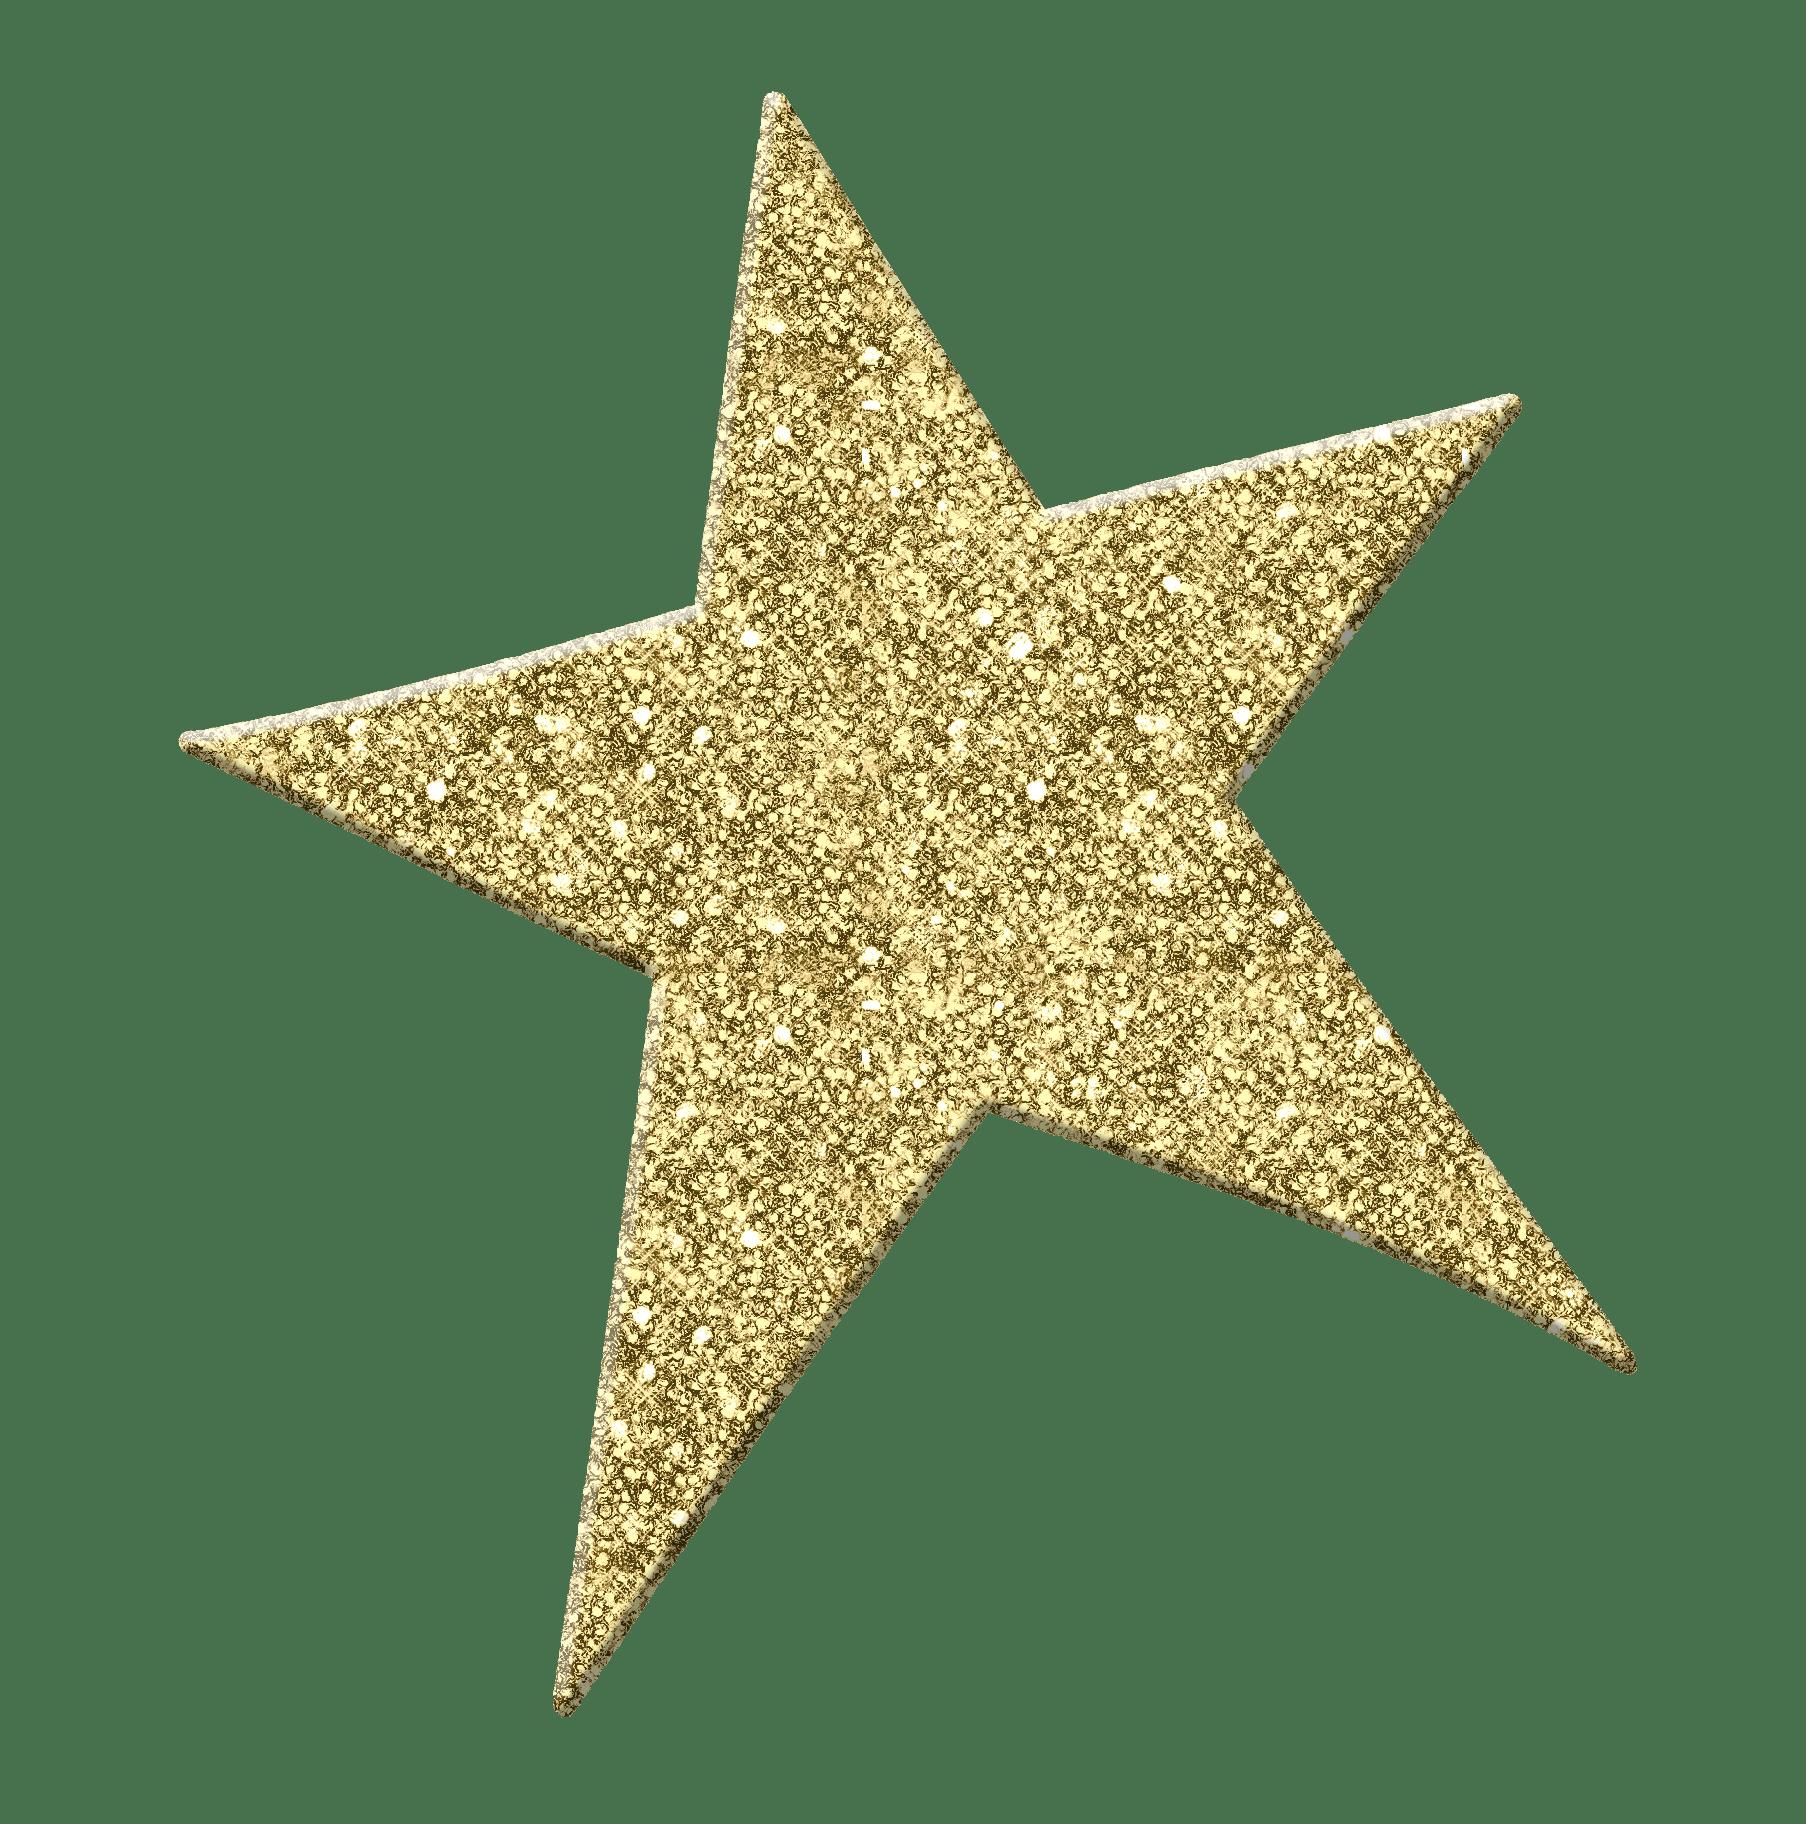 Golden Star Png Image Star Clipart Gold Glitter Stars Sparkle Png